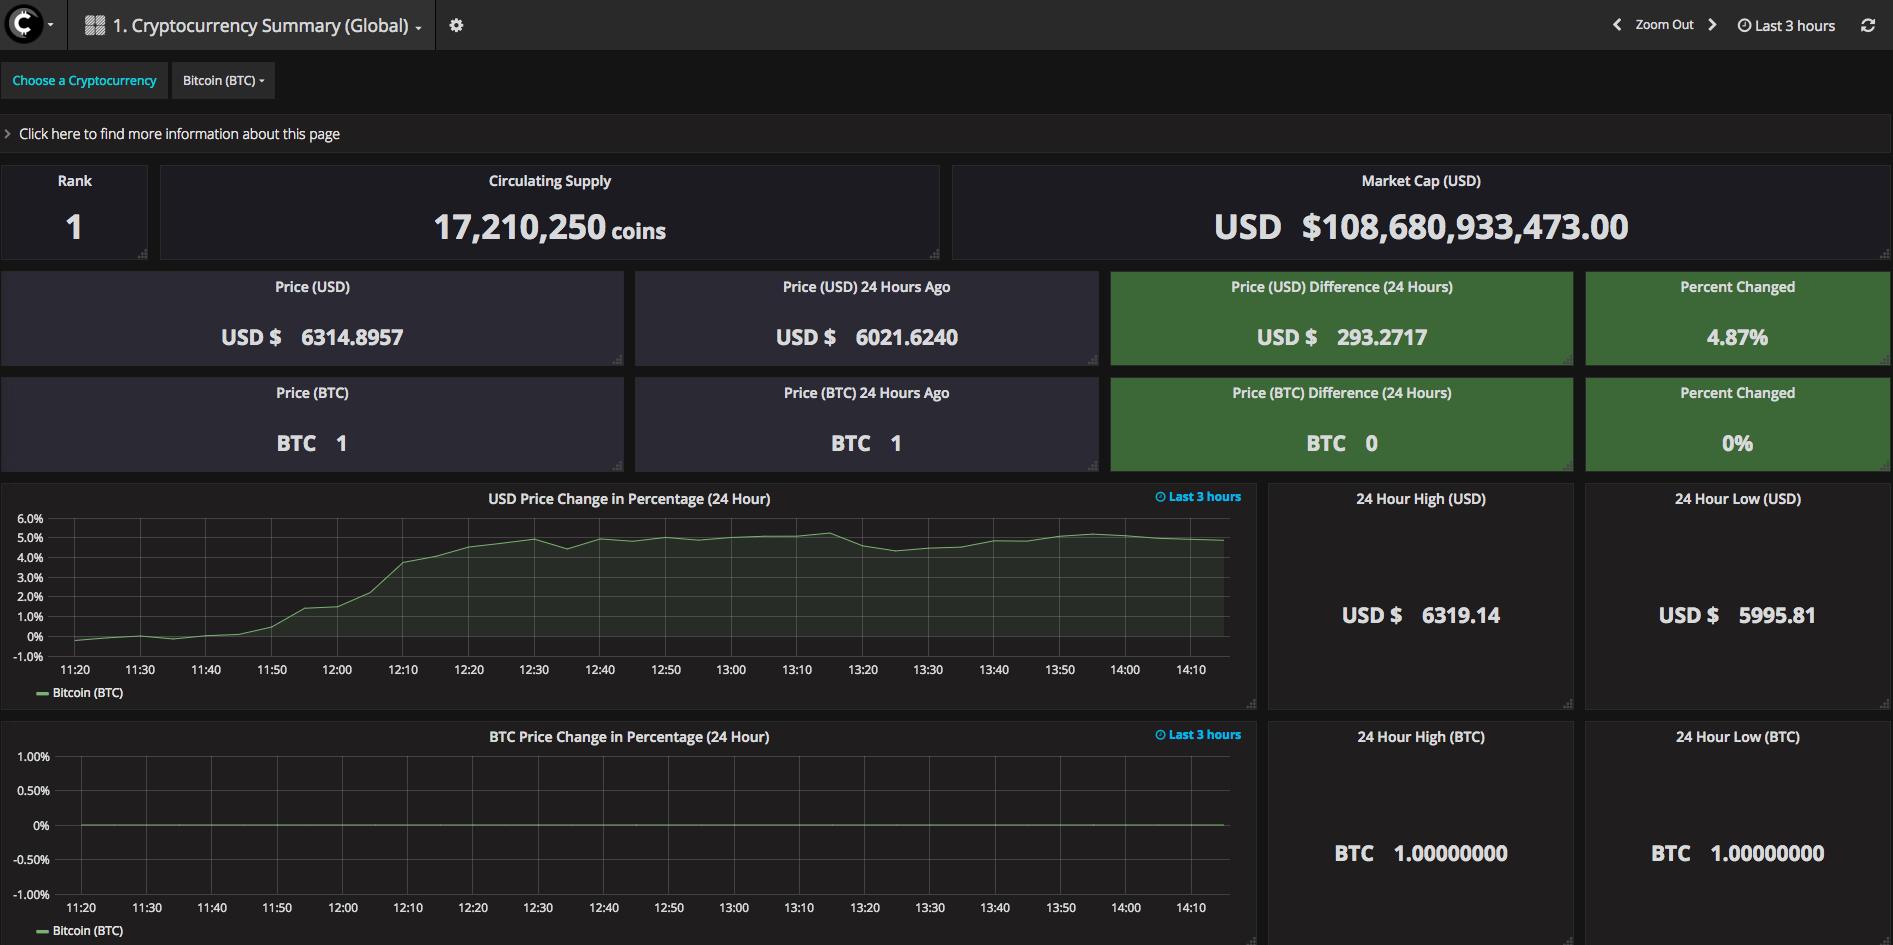 Cryptocurrency Summary Dashboard